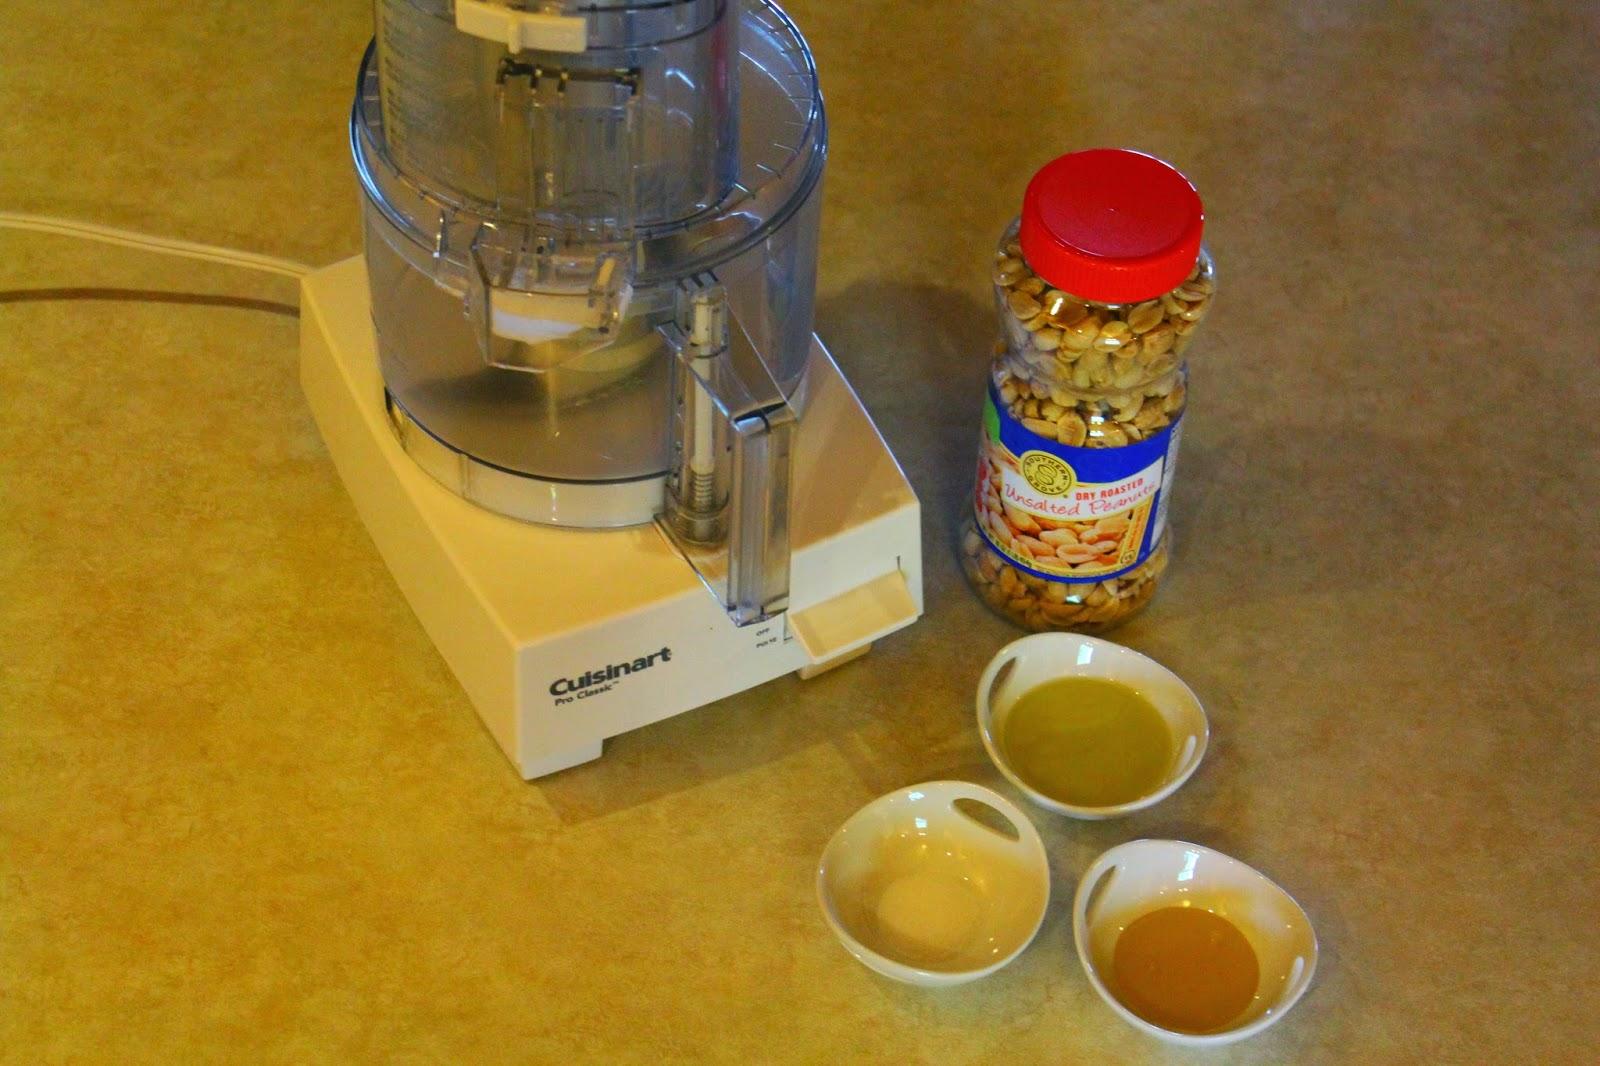 IMG 4437 - Homemade Peanut Butter